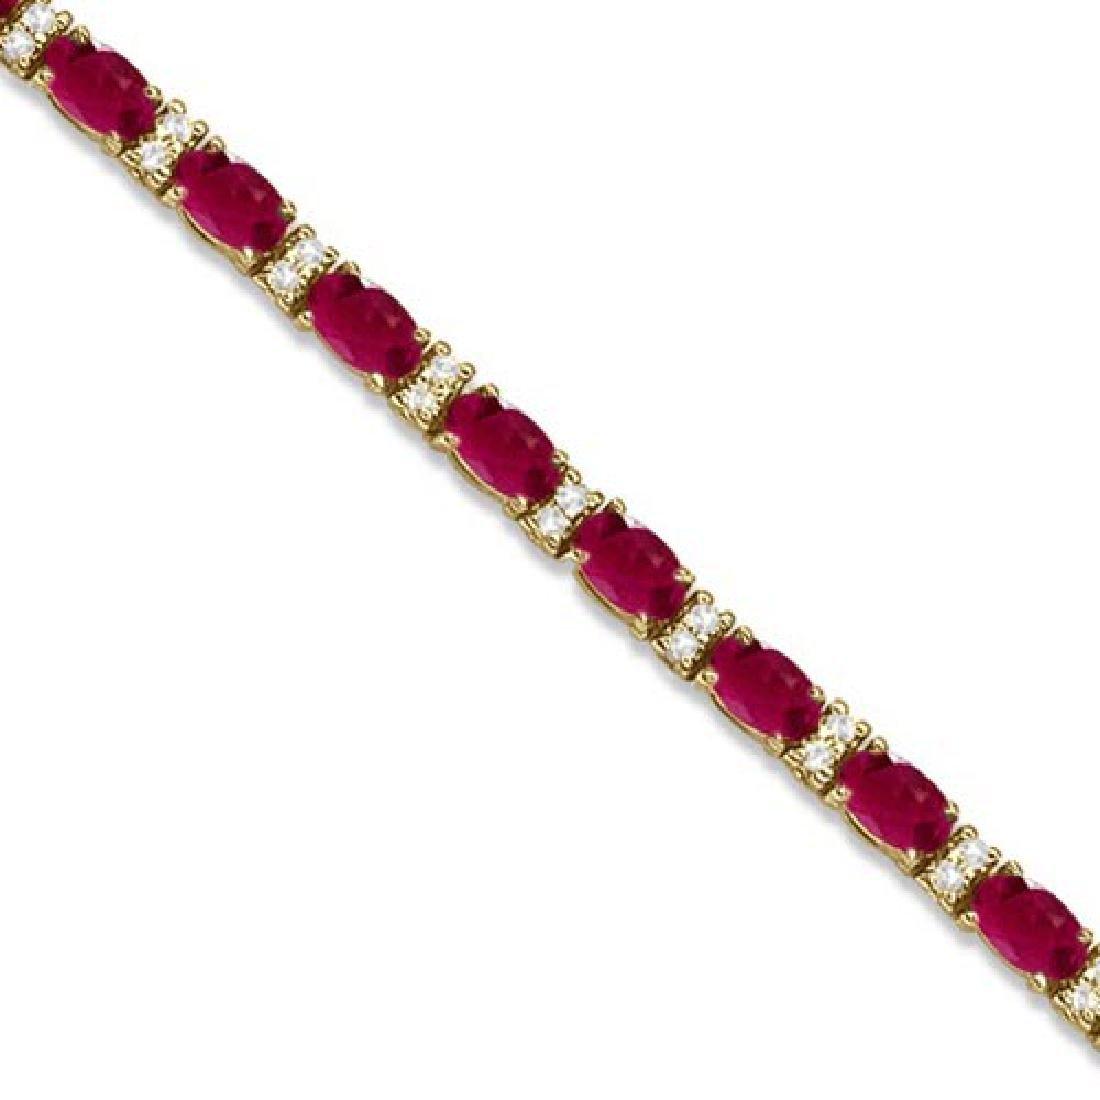 Diamond and Oval Cut Ruby Tennis Bracelet 14k Yellow Go